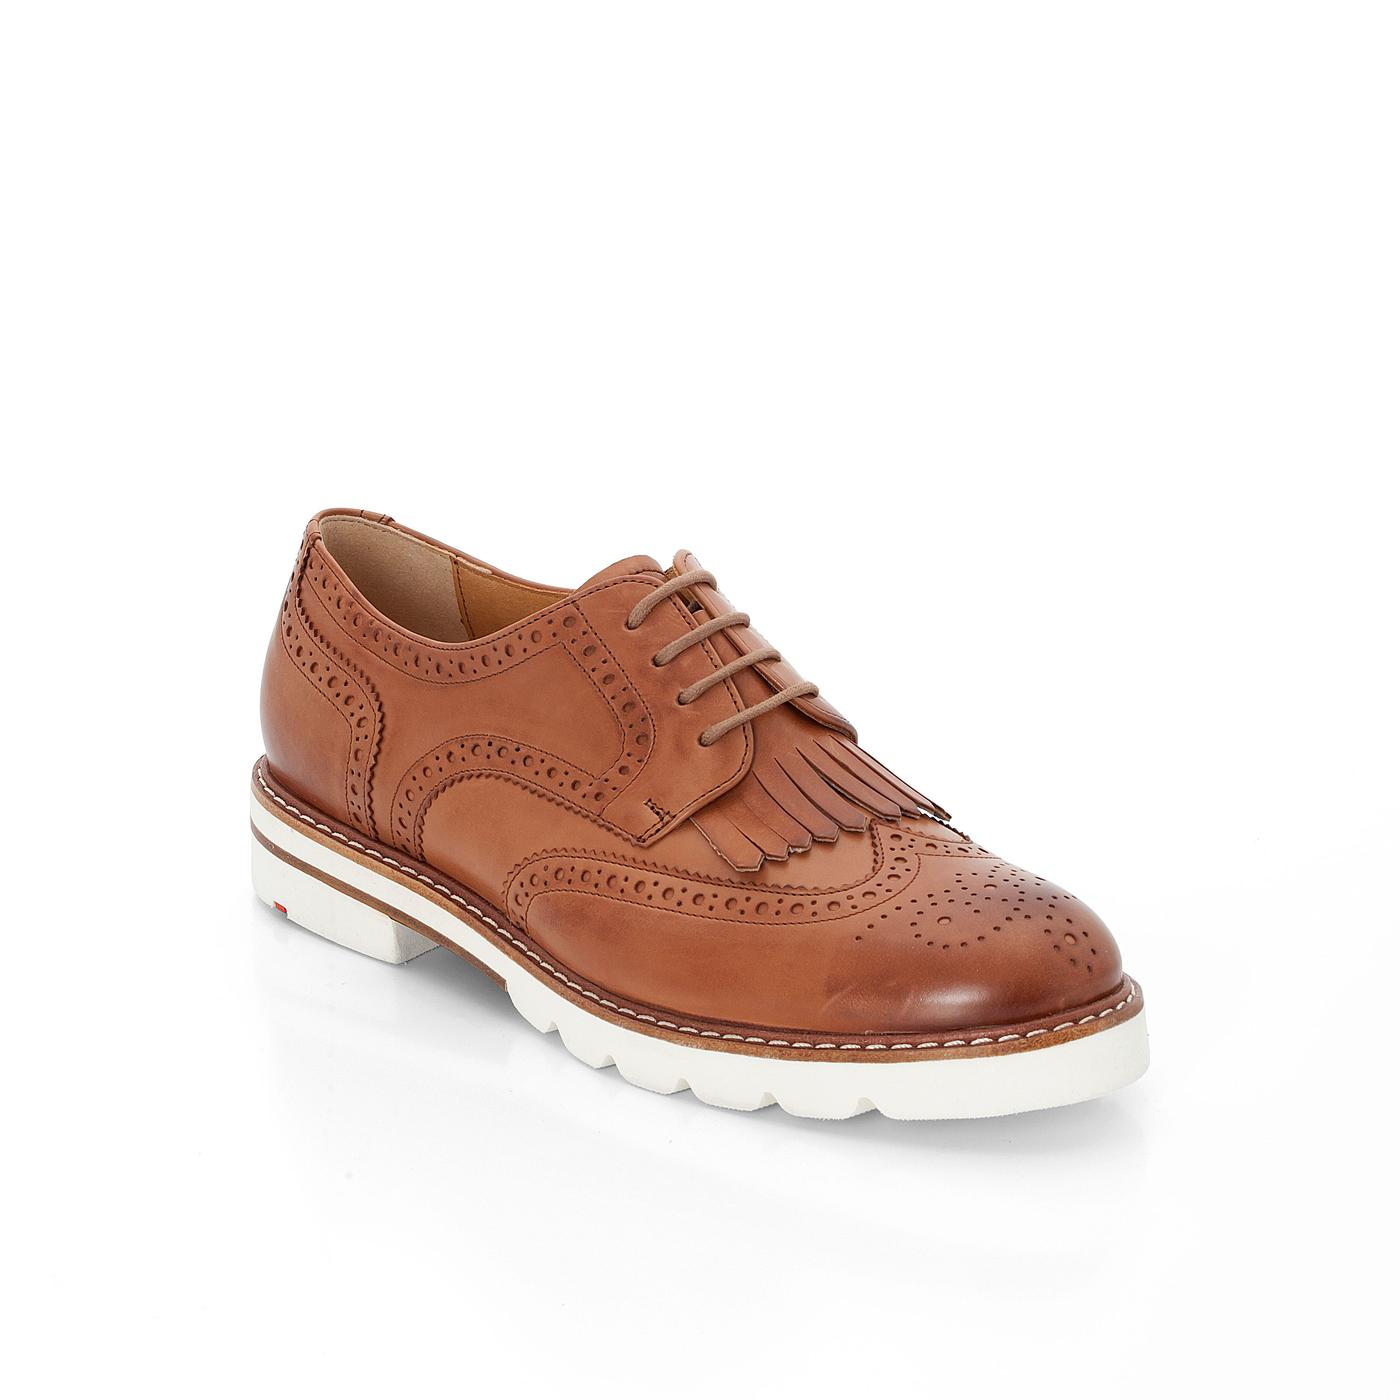 Halbschuhe | Schuhe > Boots > Schnürboots | Braun | Glattleder -  leder | LLOYD